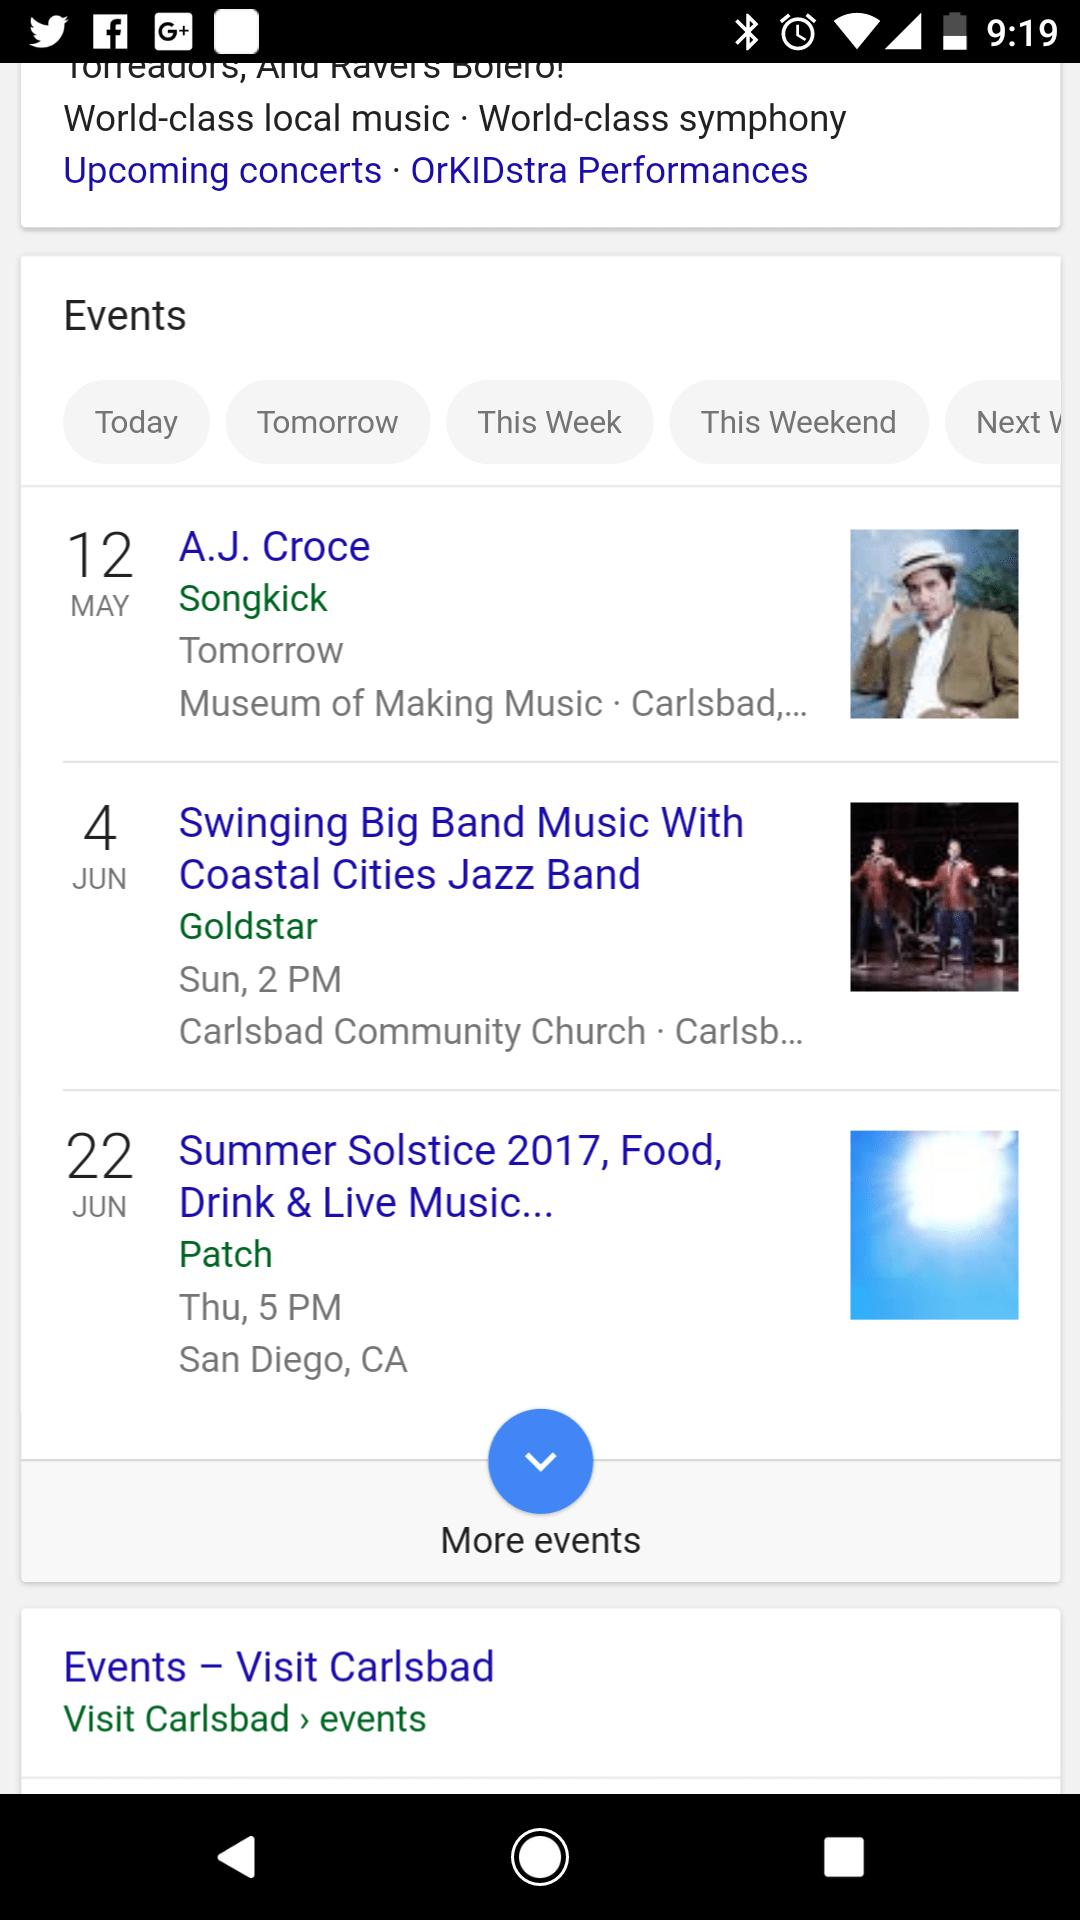 Google Music Events Near Me